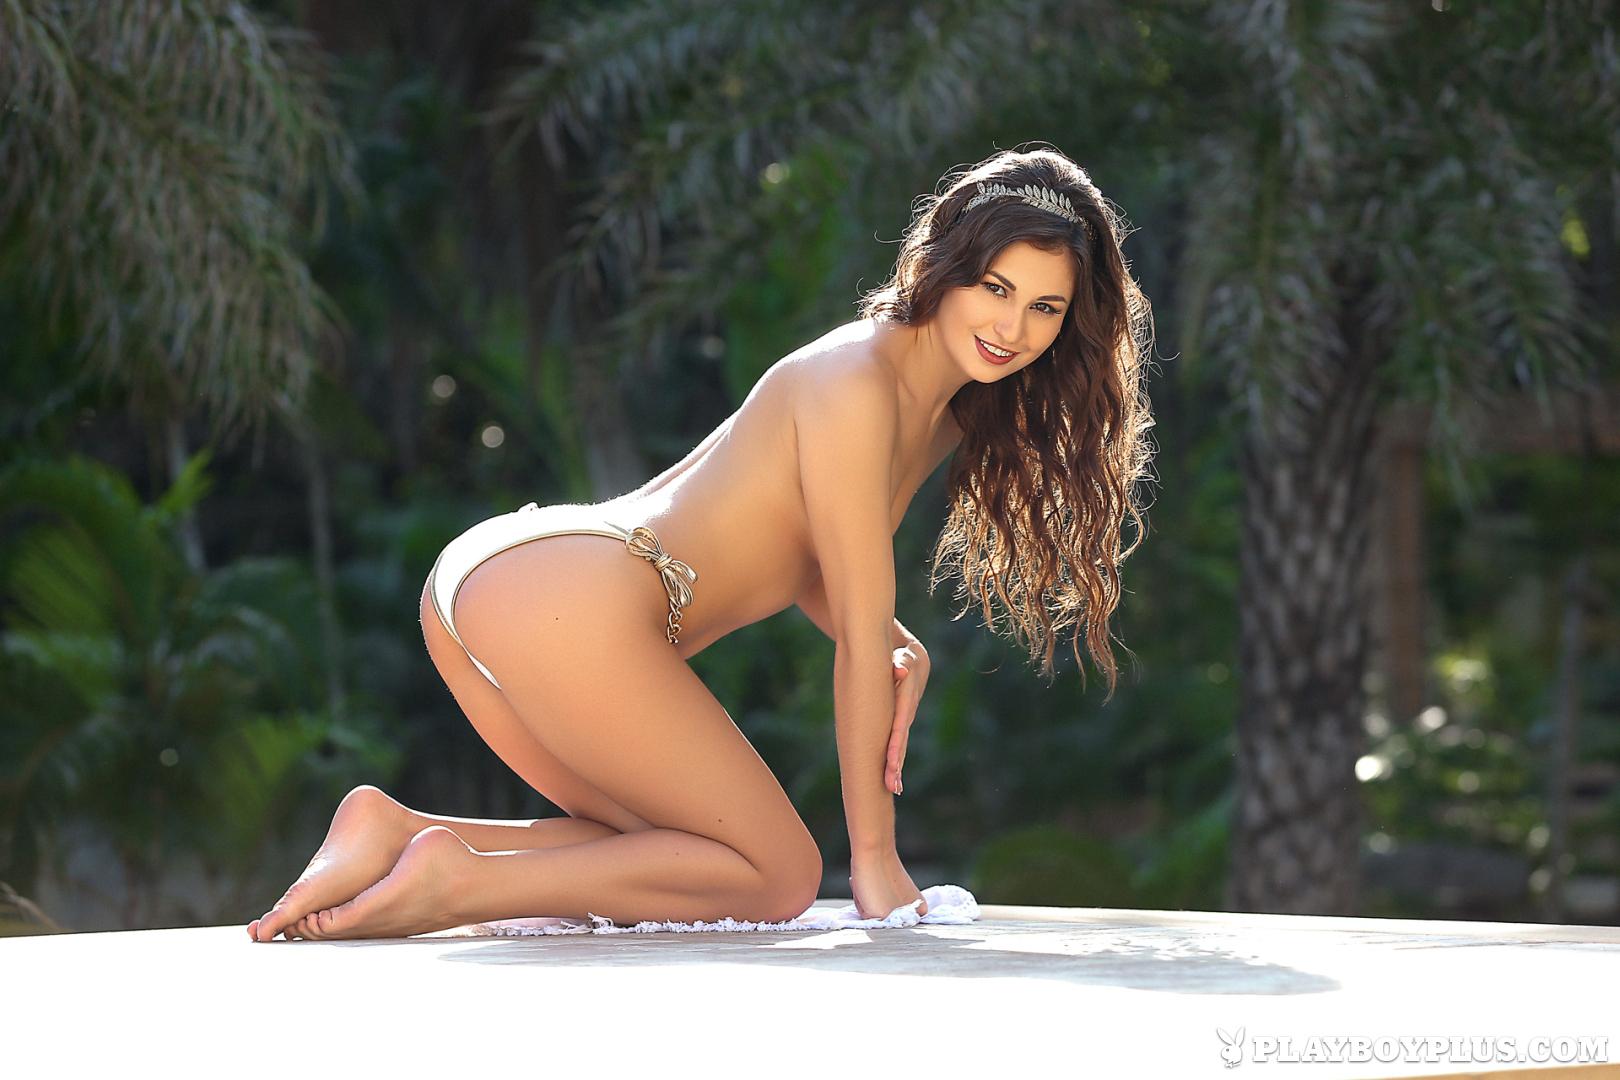 Playboy Cybergirl Demi Fray Nude outside